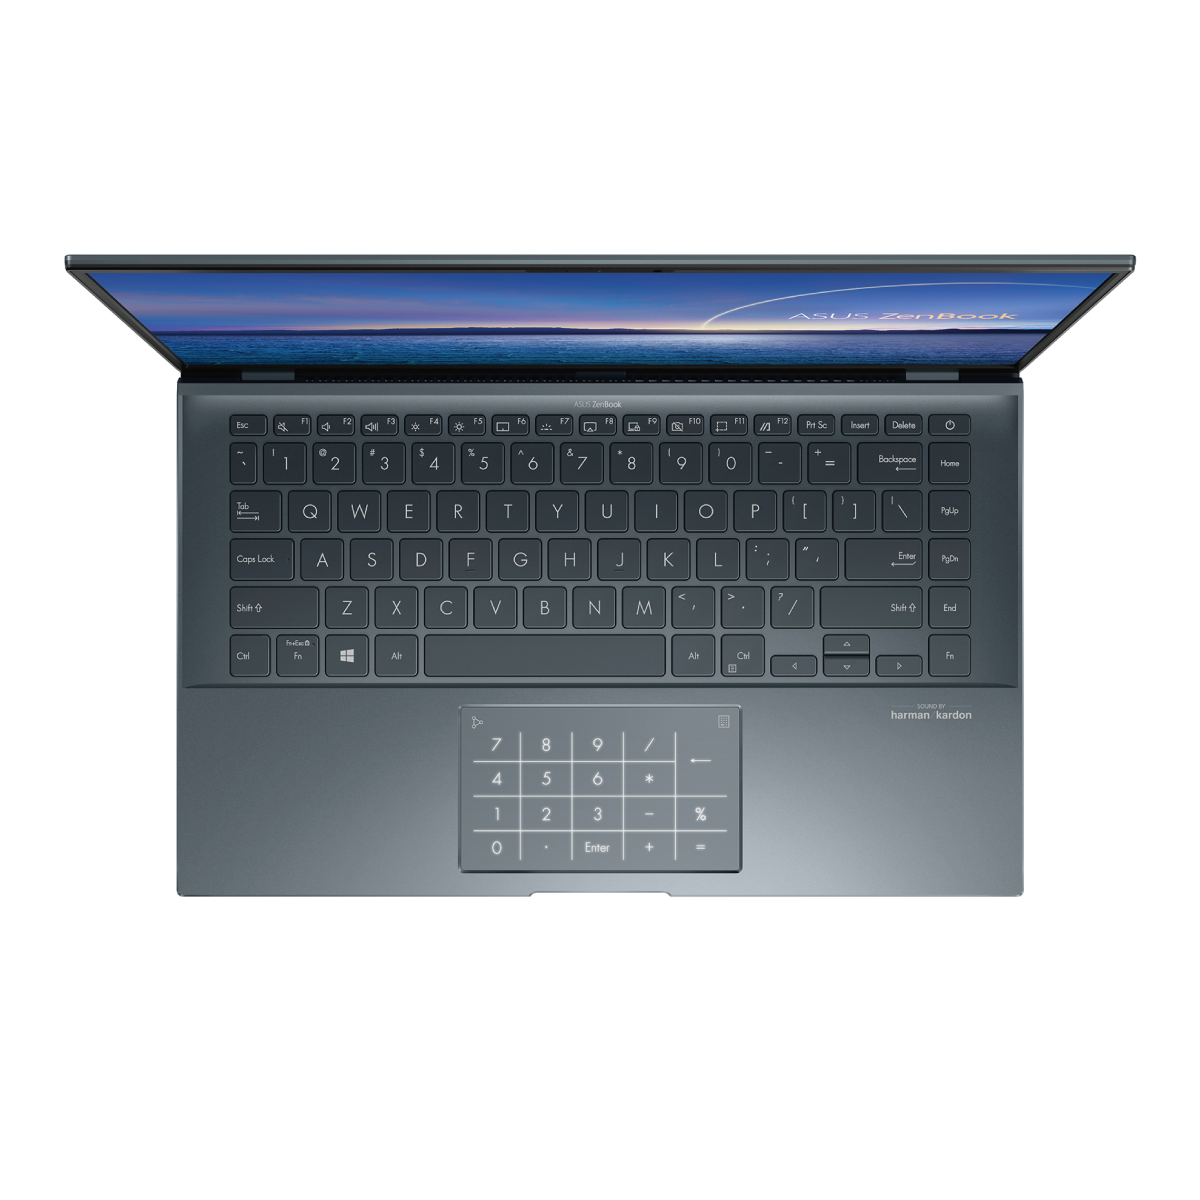 ASUS Zenbook 14 UX435EAL